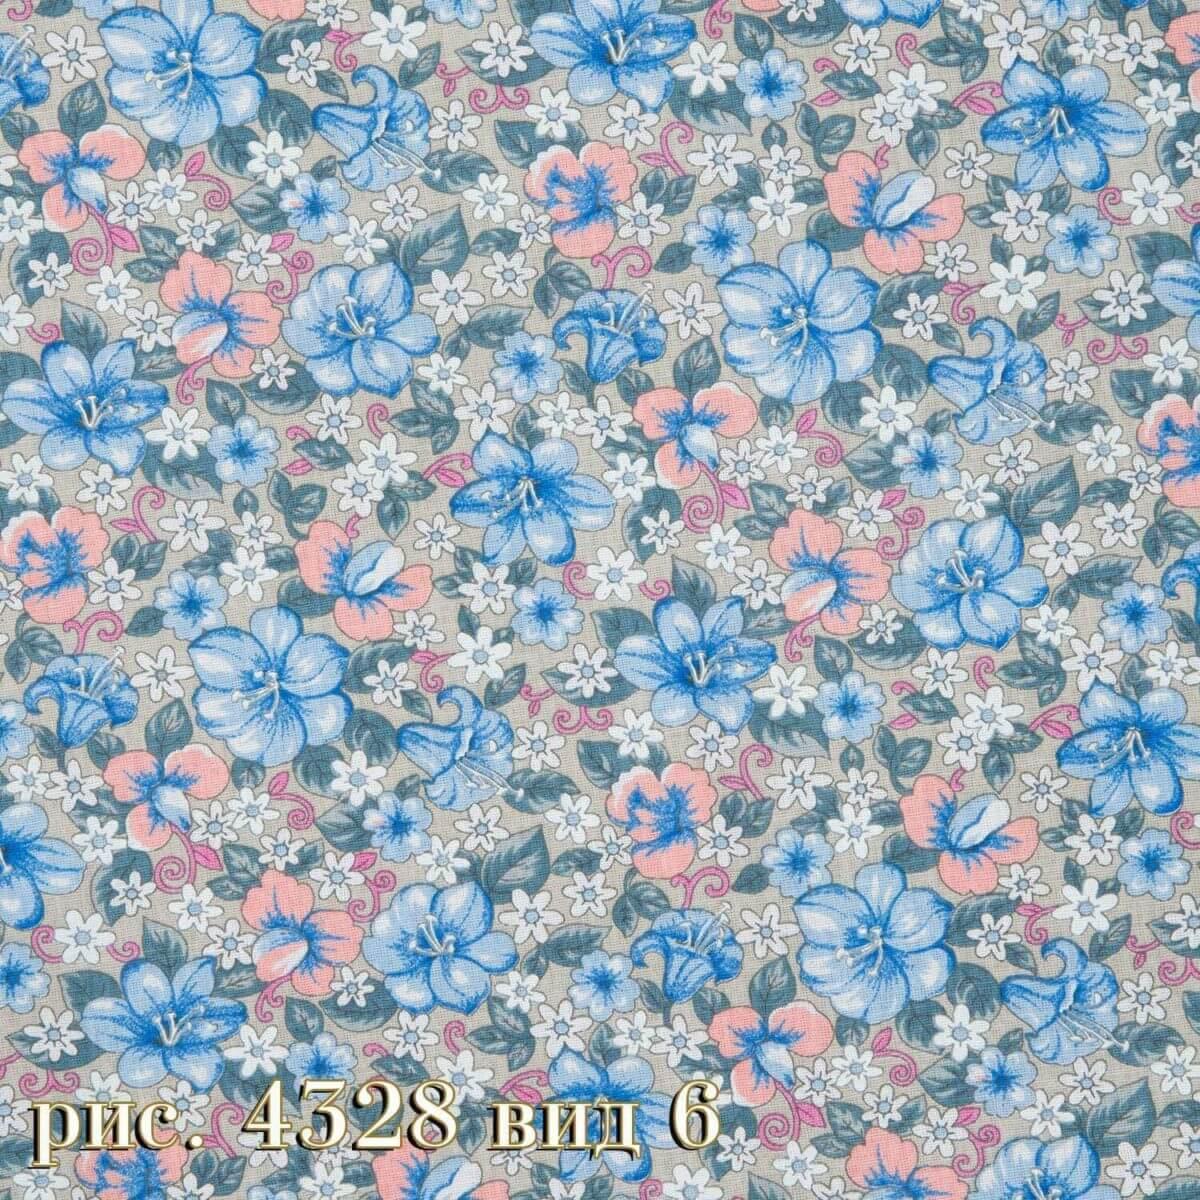 Фото 14 - Плательная ткань бязь 150 см (4328/6) Под заказ.